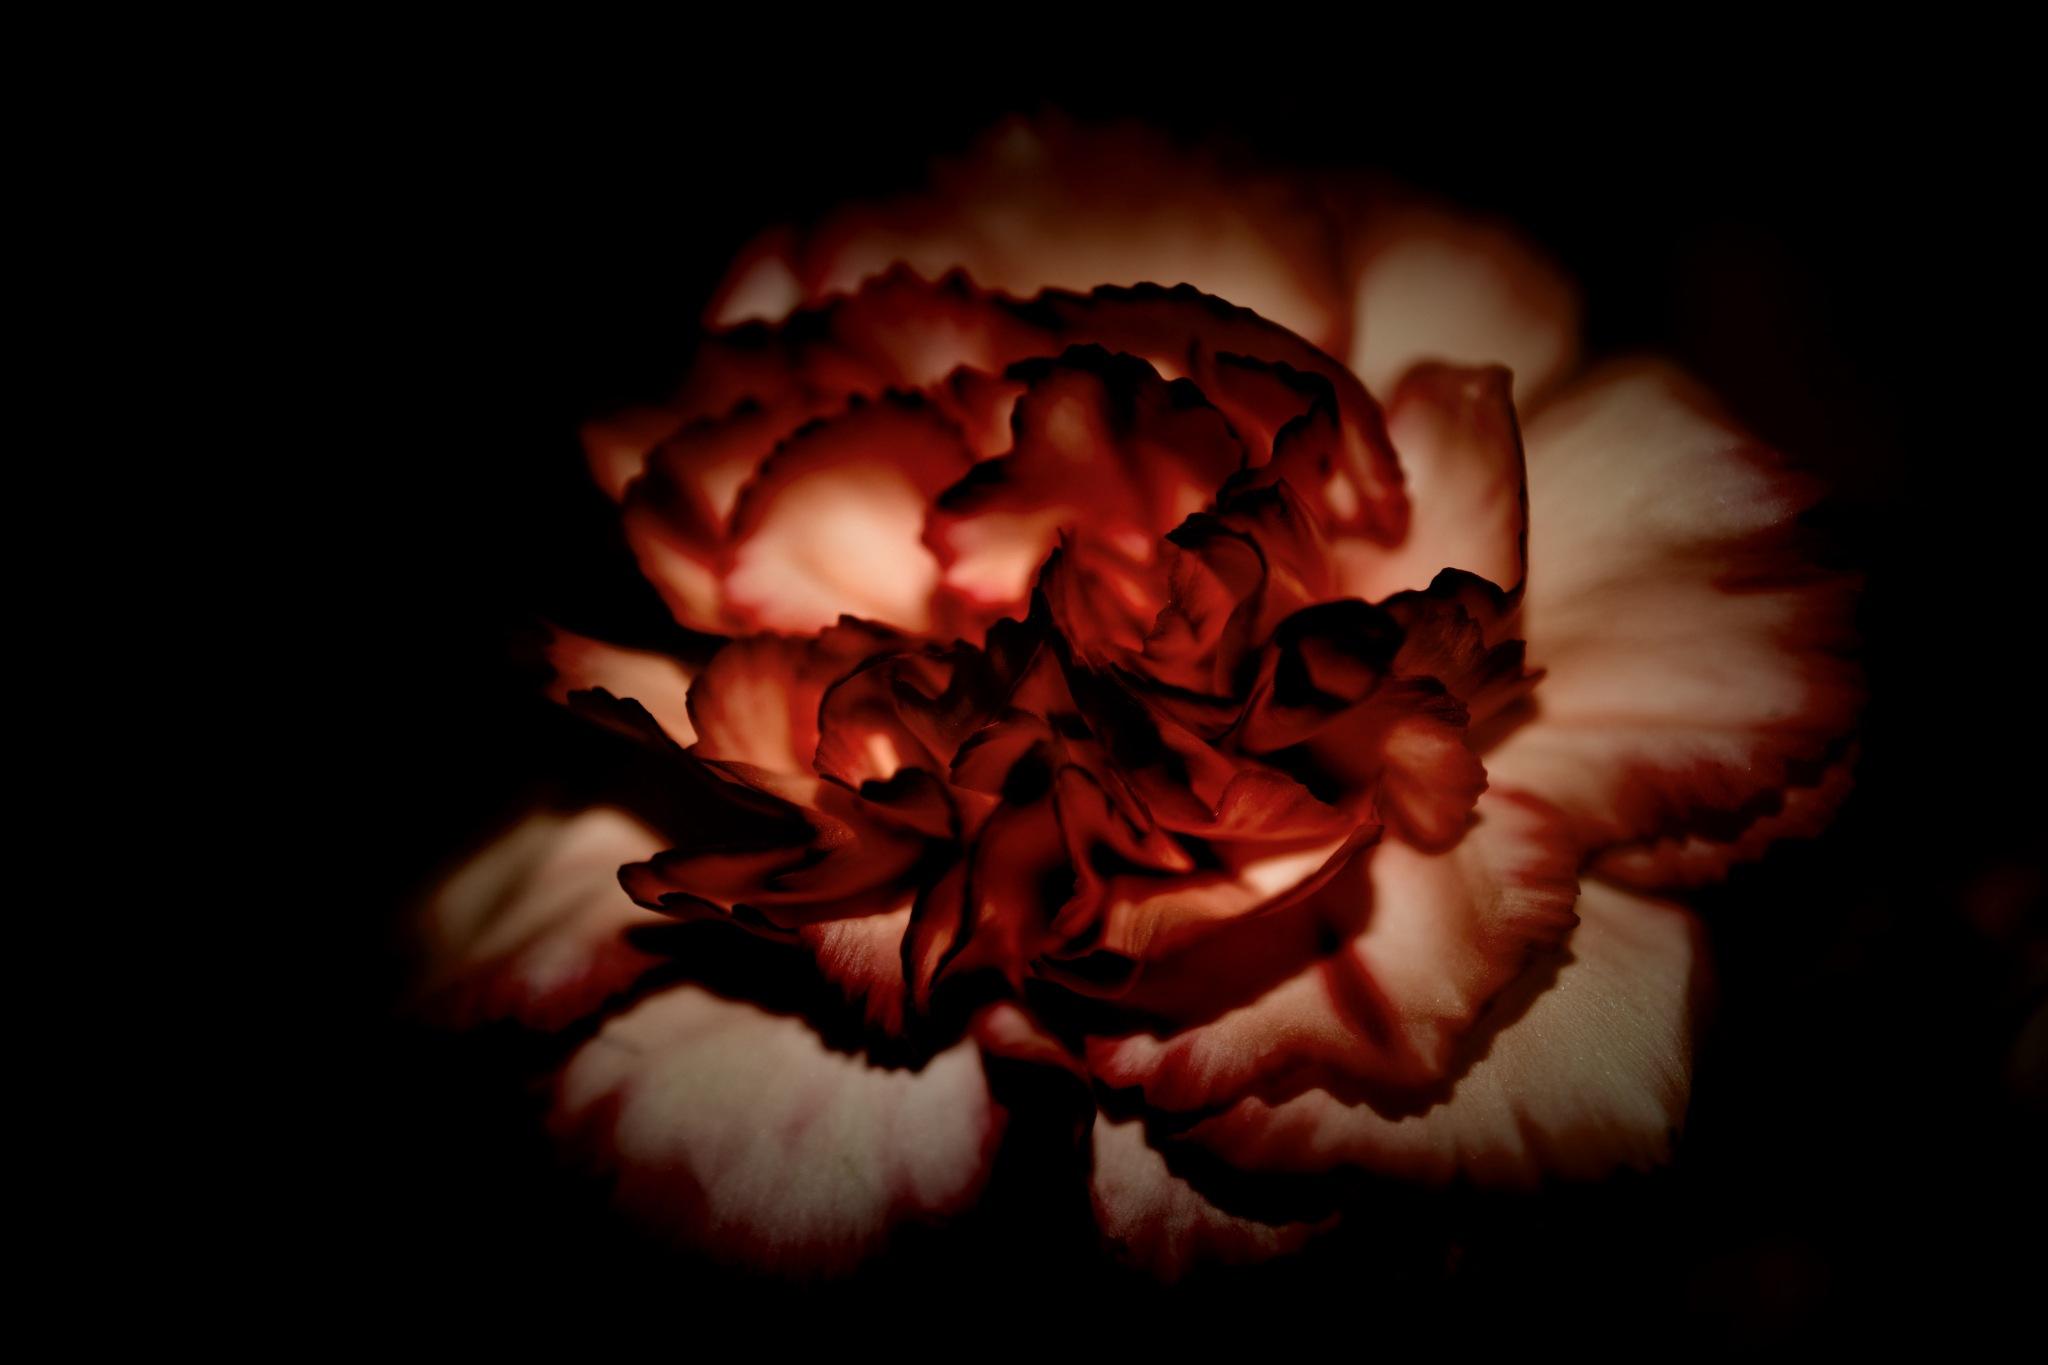 carnation by pgavin5000